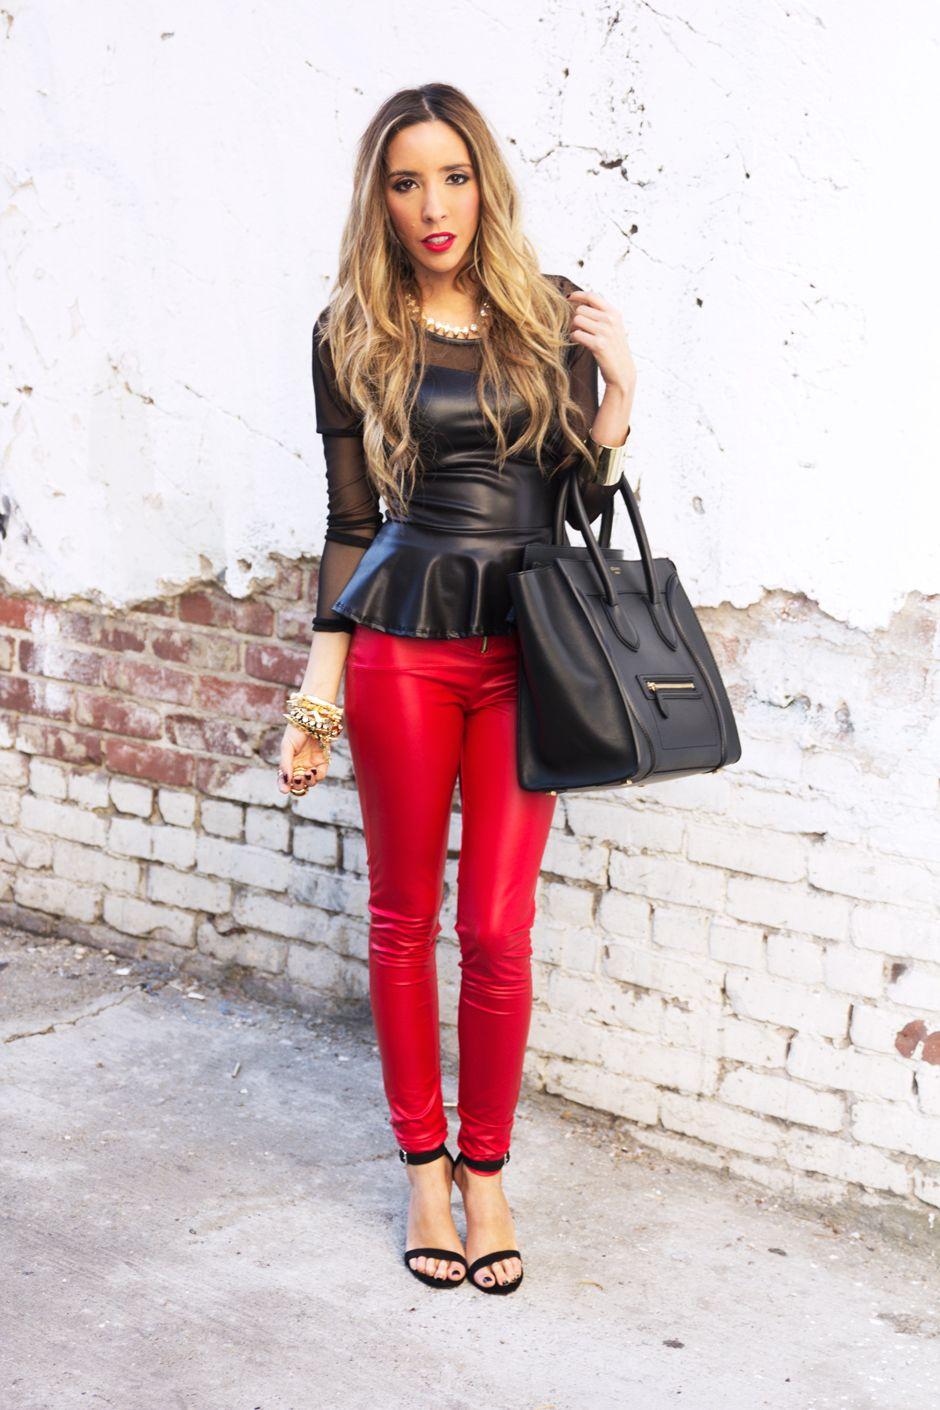 59ad07fd3e1 Shop Haute   Rebellious. Find this Pin and more on Street Style by Maria De  La Cruz ...